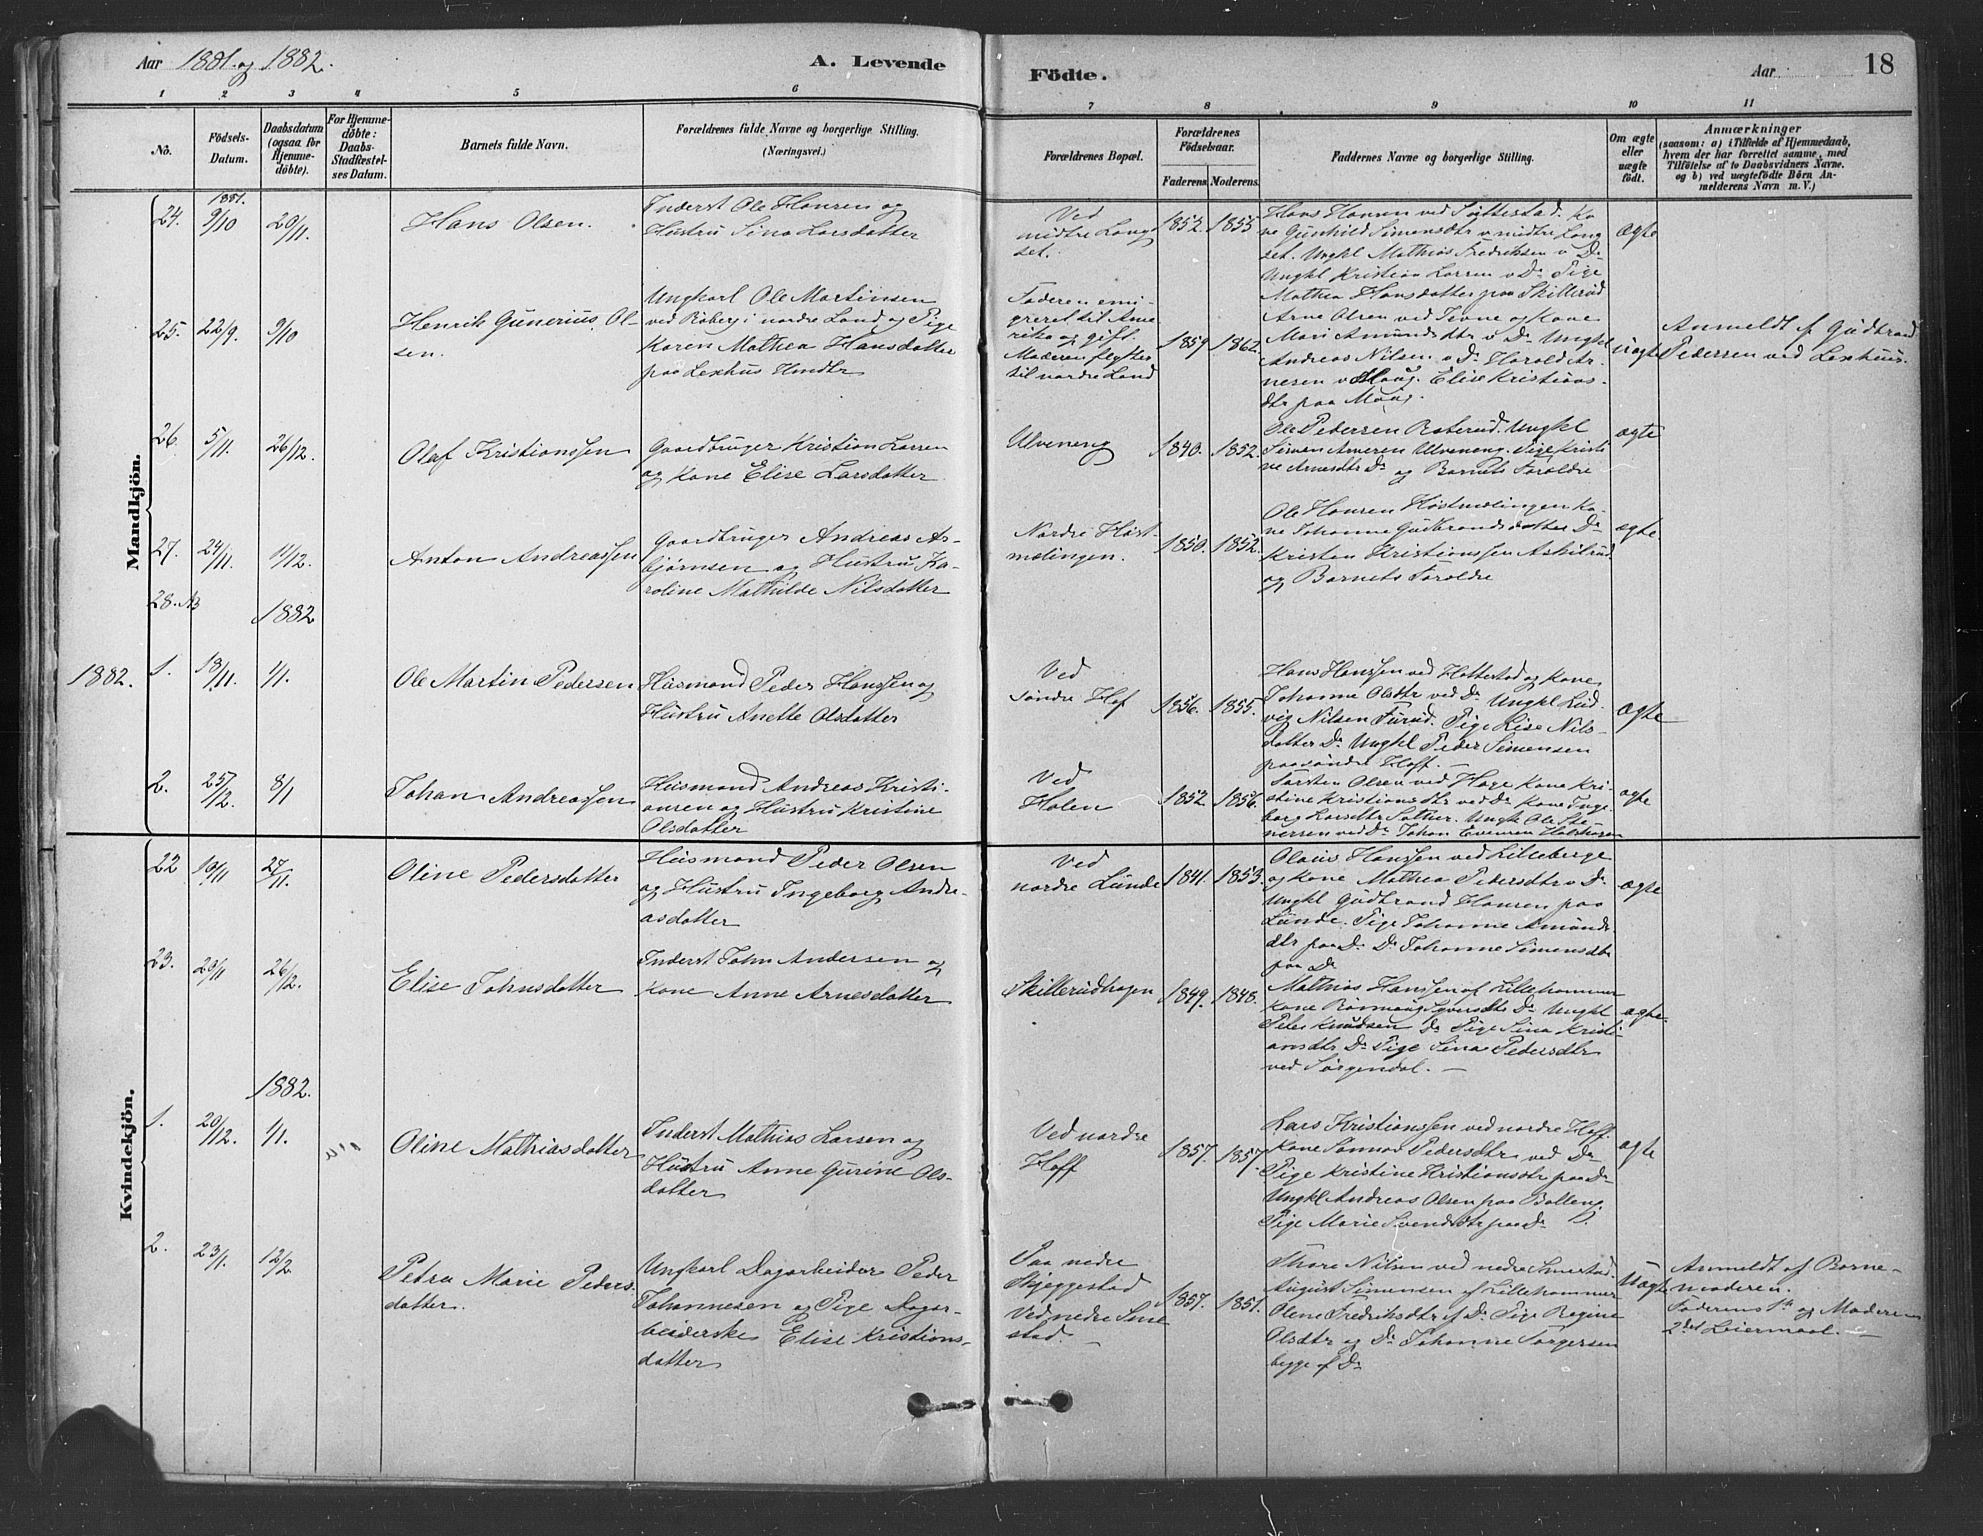 SAH, Fåberg prestekontor, Ministerialbok nr. 9, 1879-1898, s. 18